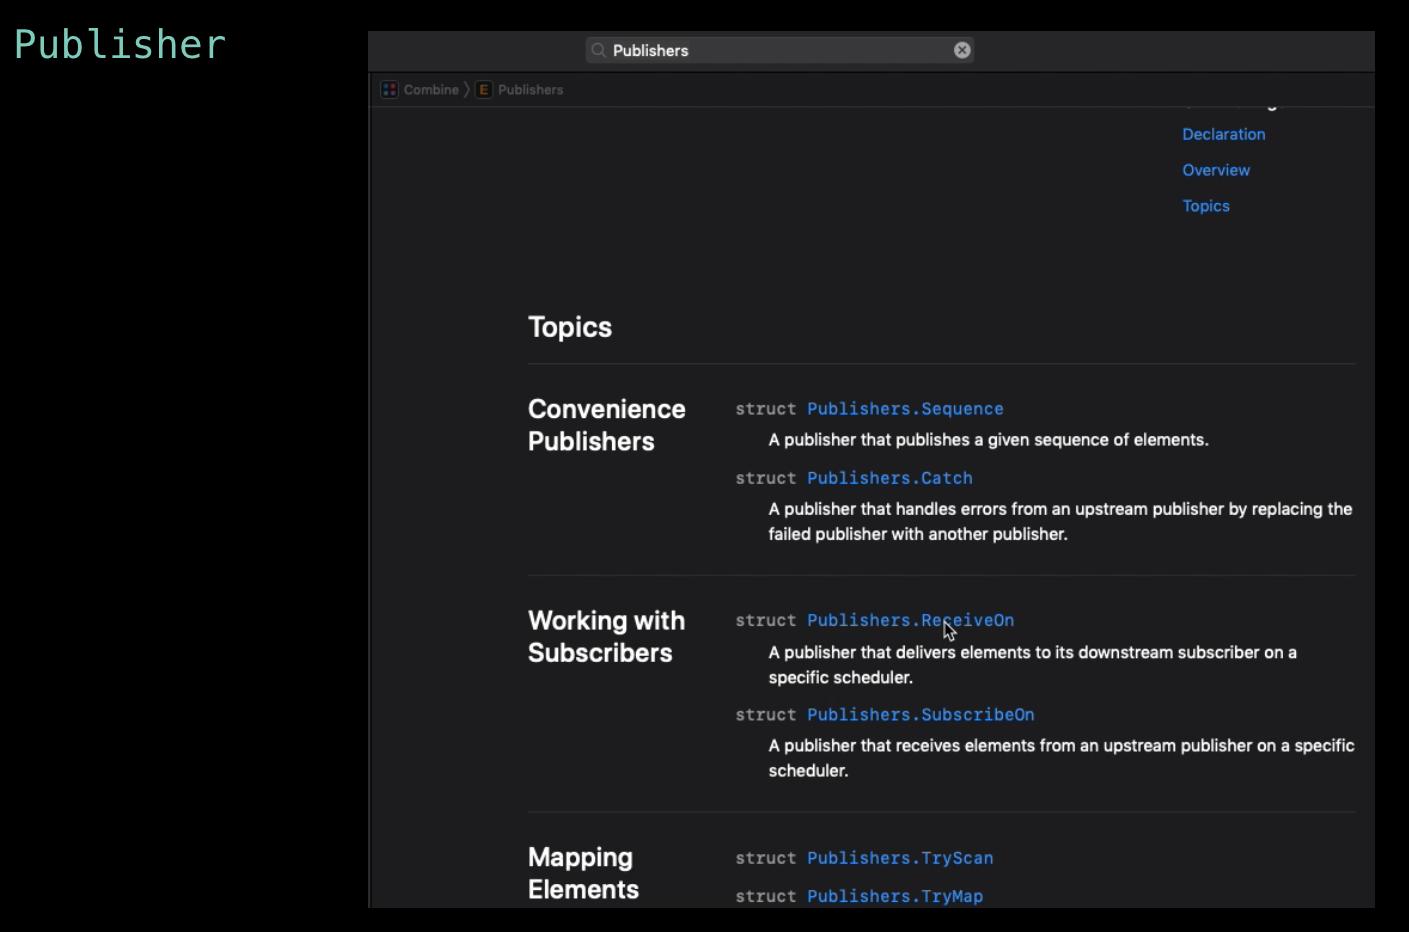 Apple 提供了满足几乎所有场景的 Publiser